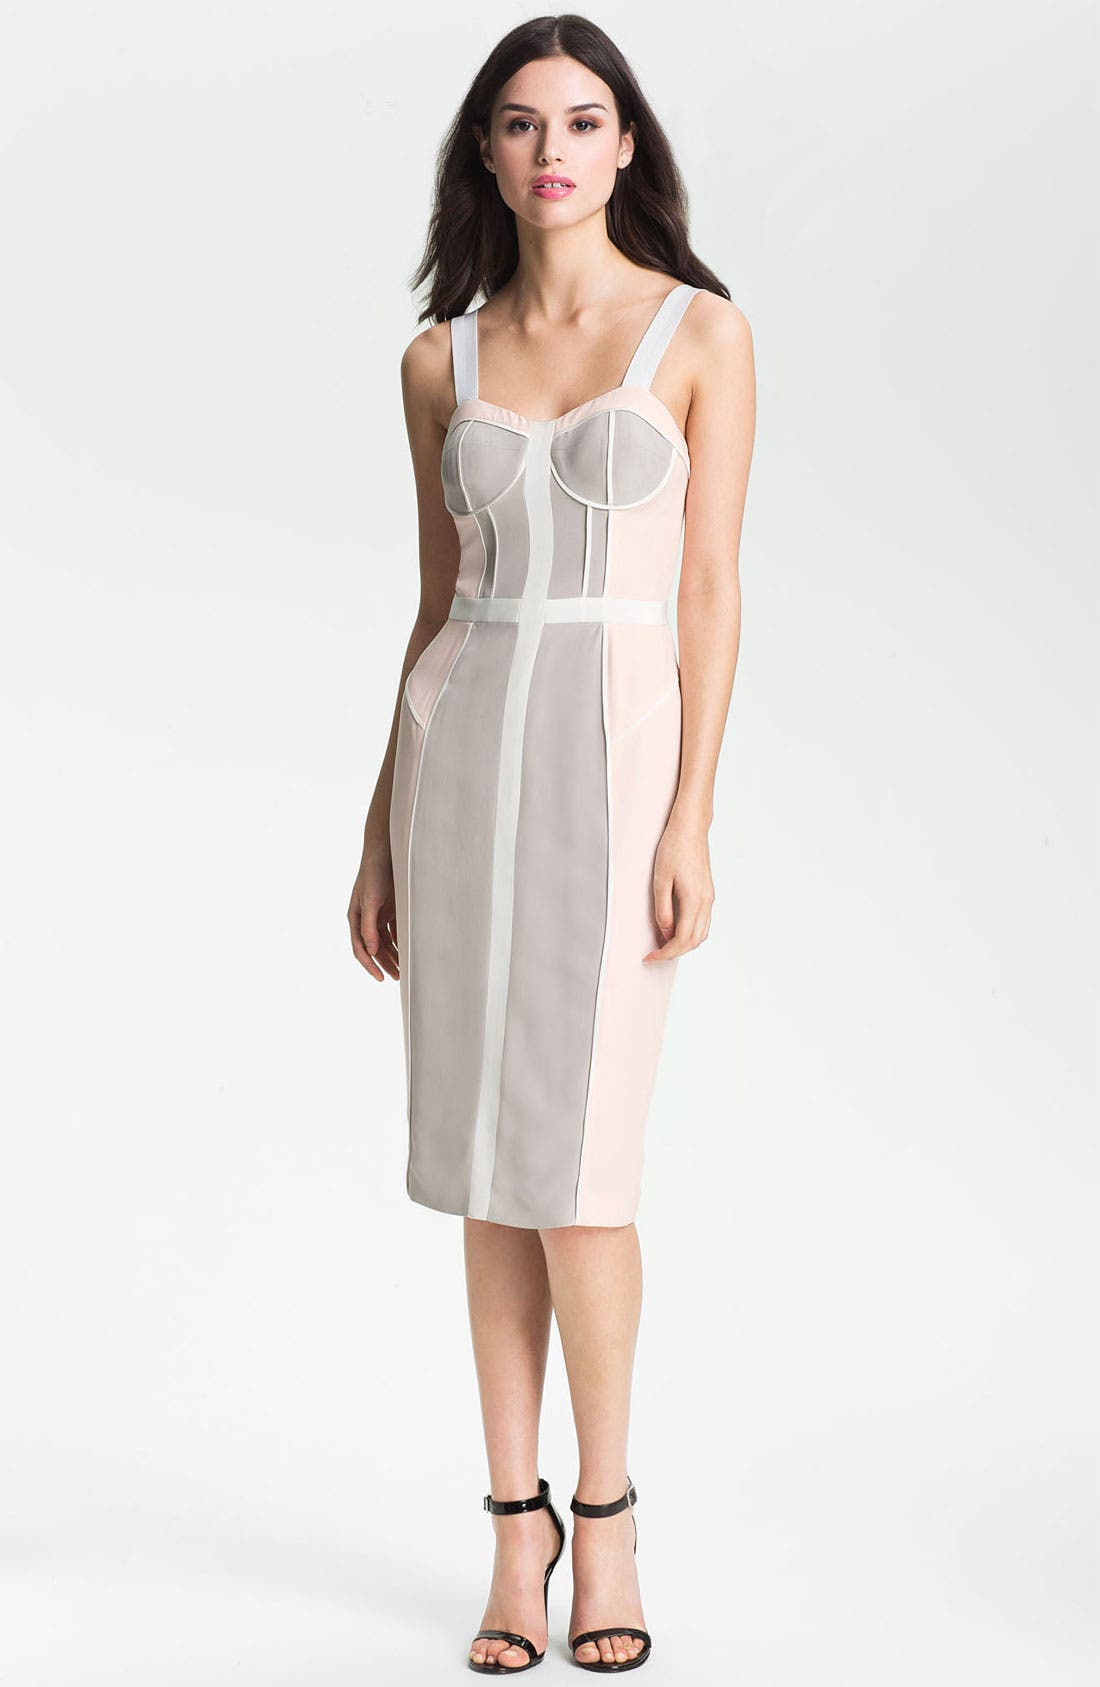 Main Image - Rebecca Minkoff 'Clarissa' Colorblock Bustier Dress